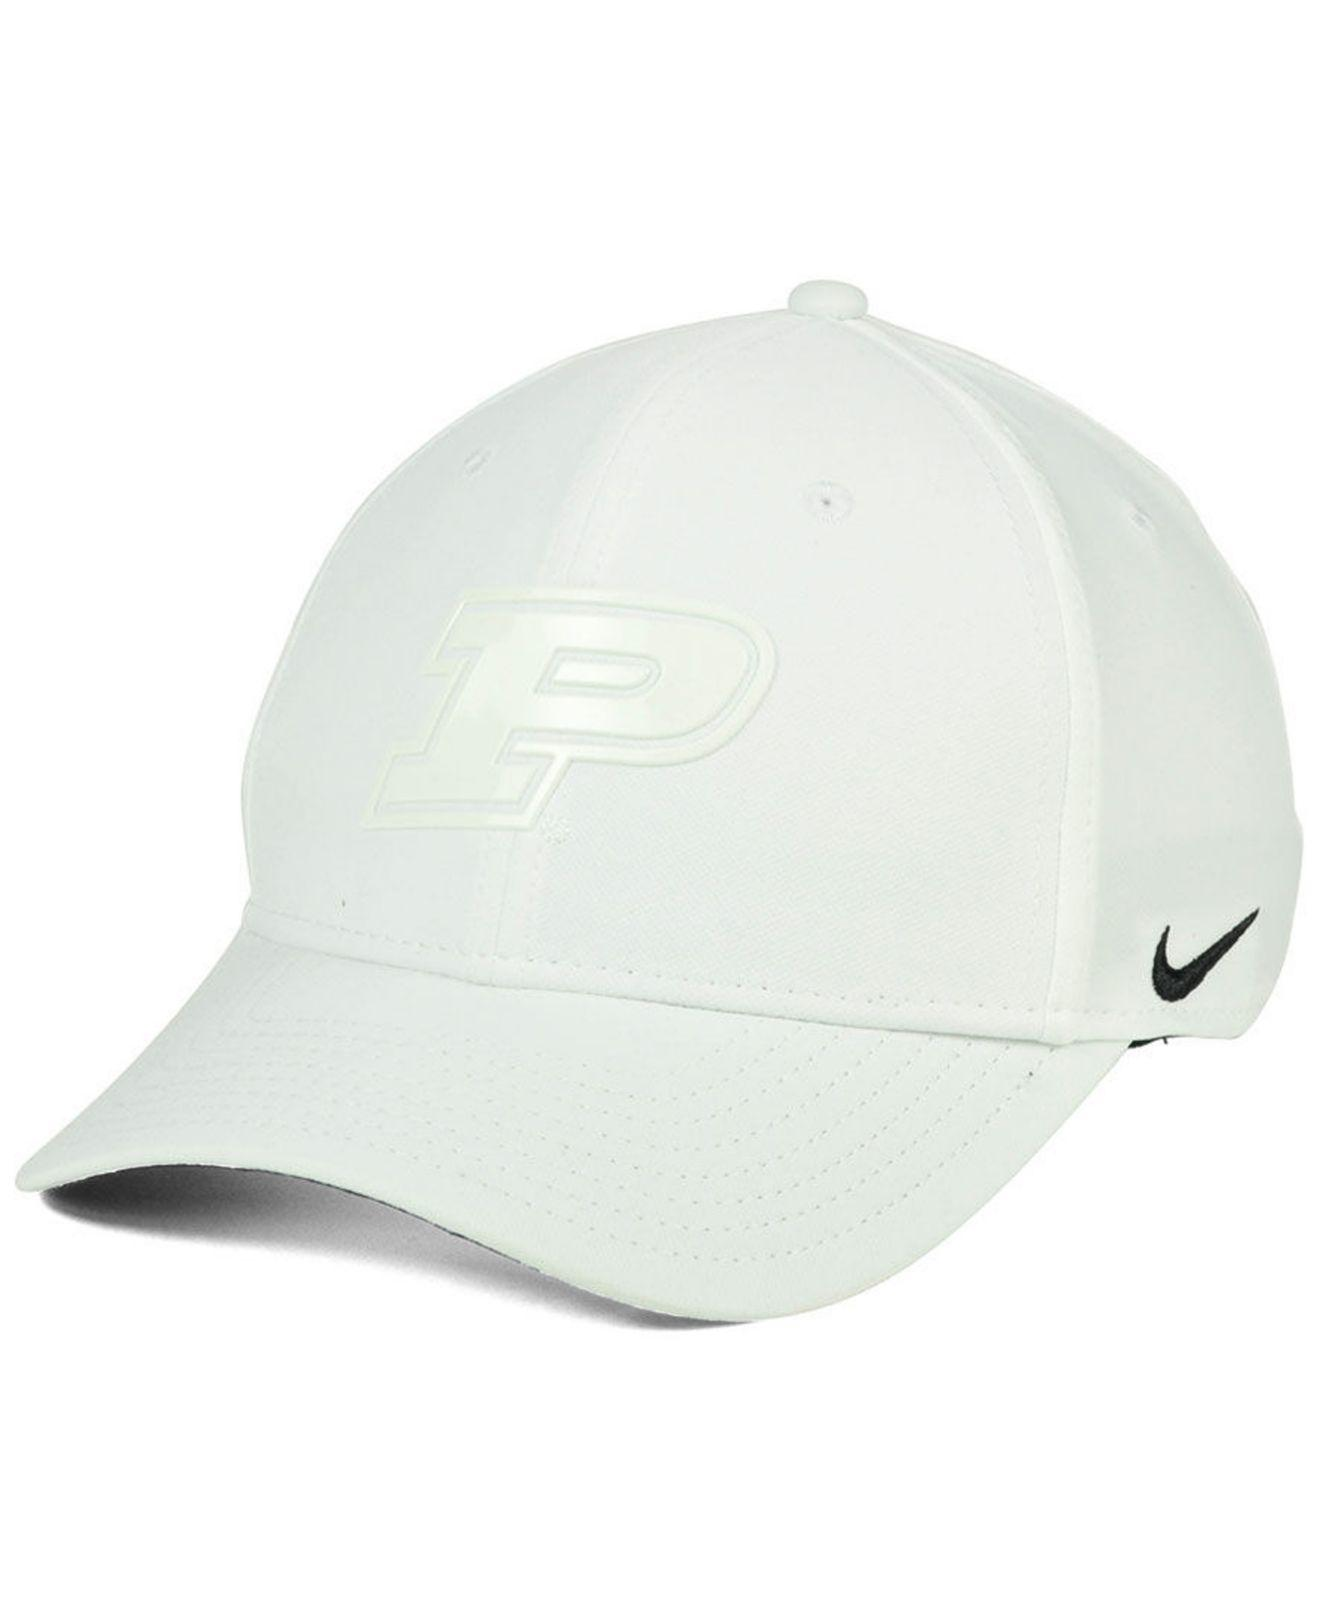 hot sale online 66ee8 f012b top quality purdue nike hat fe633 c0654